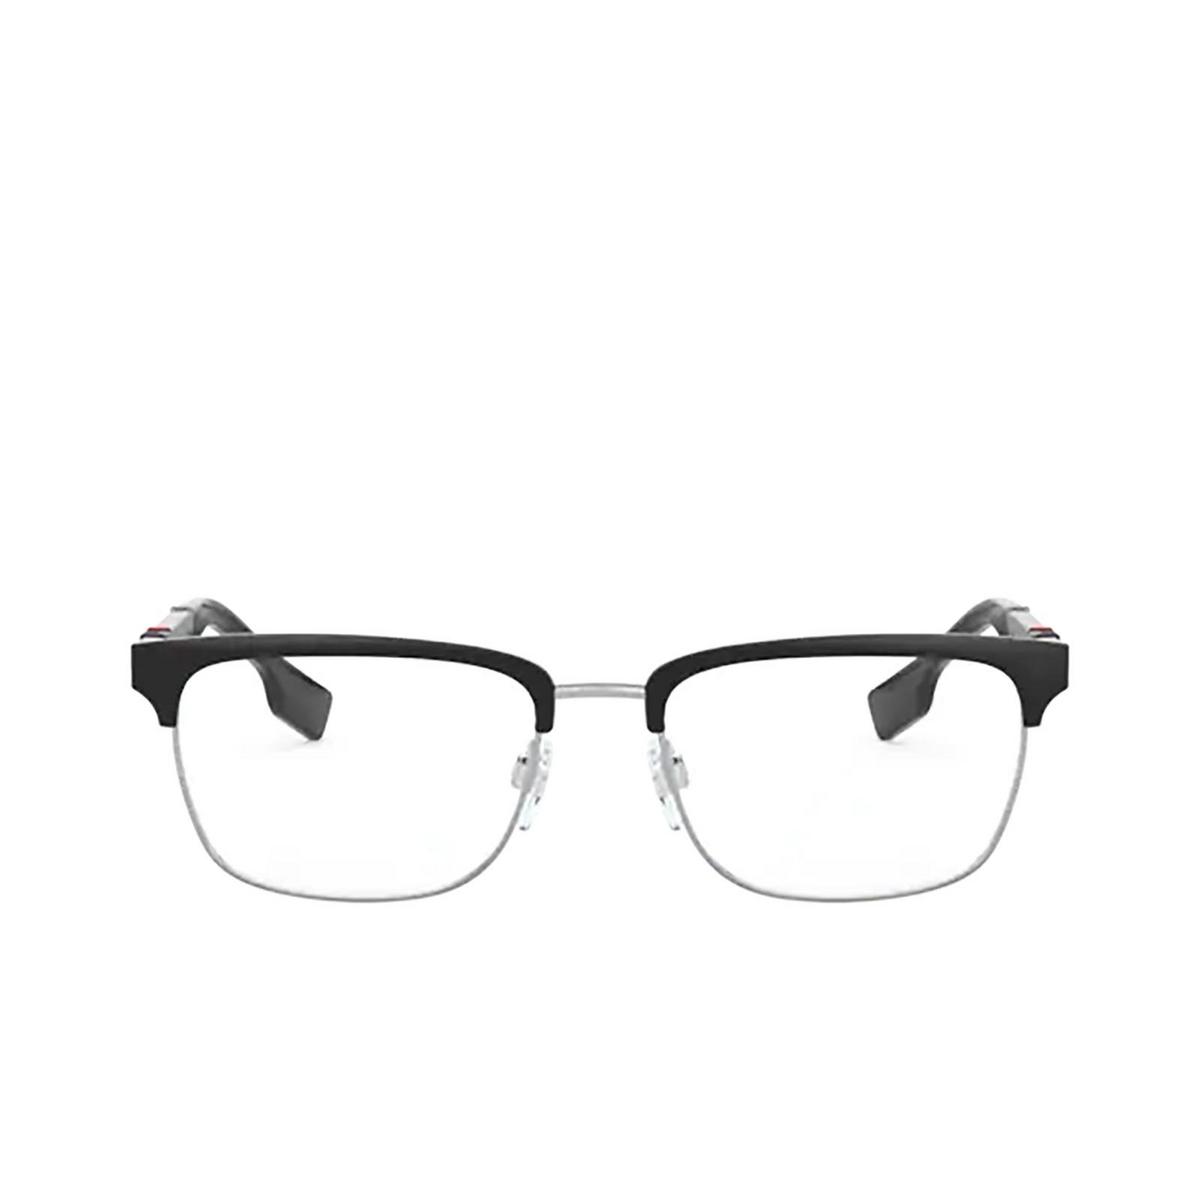 Burberry® Rectangle Eyeglasses: Alba BE1348 color Silver / Matte Black 1306 - front view.